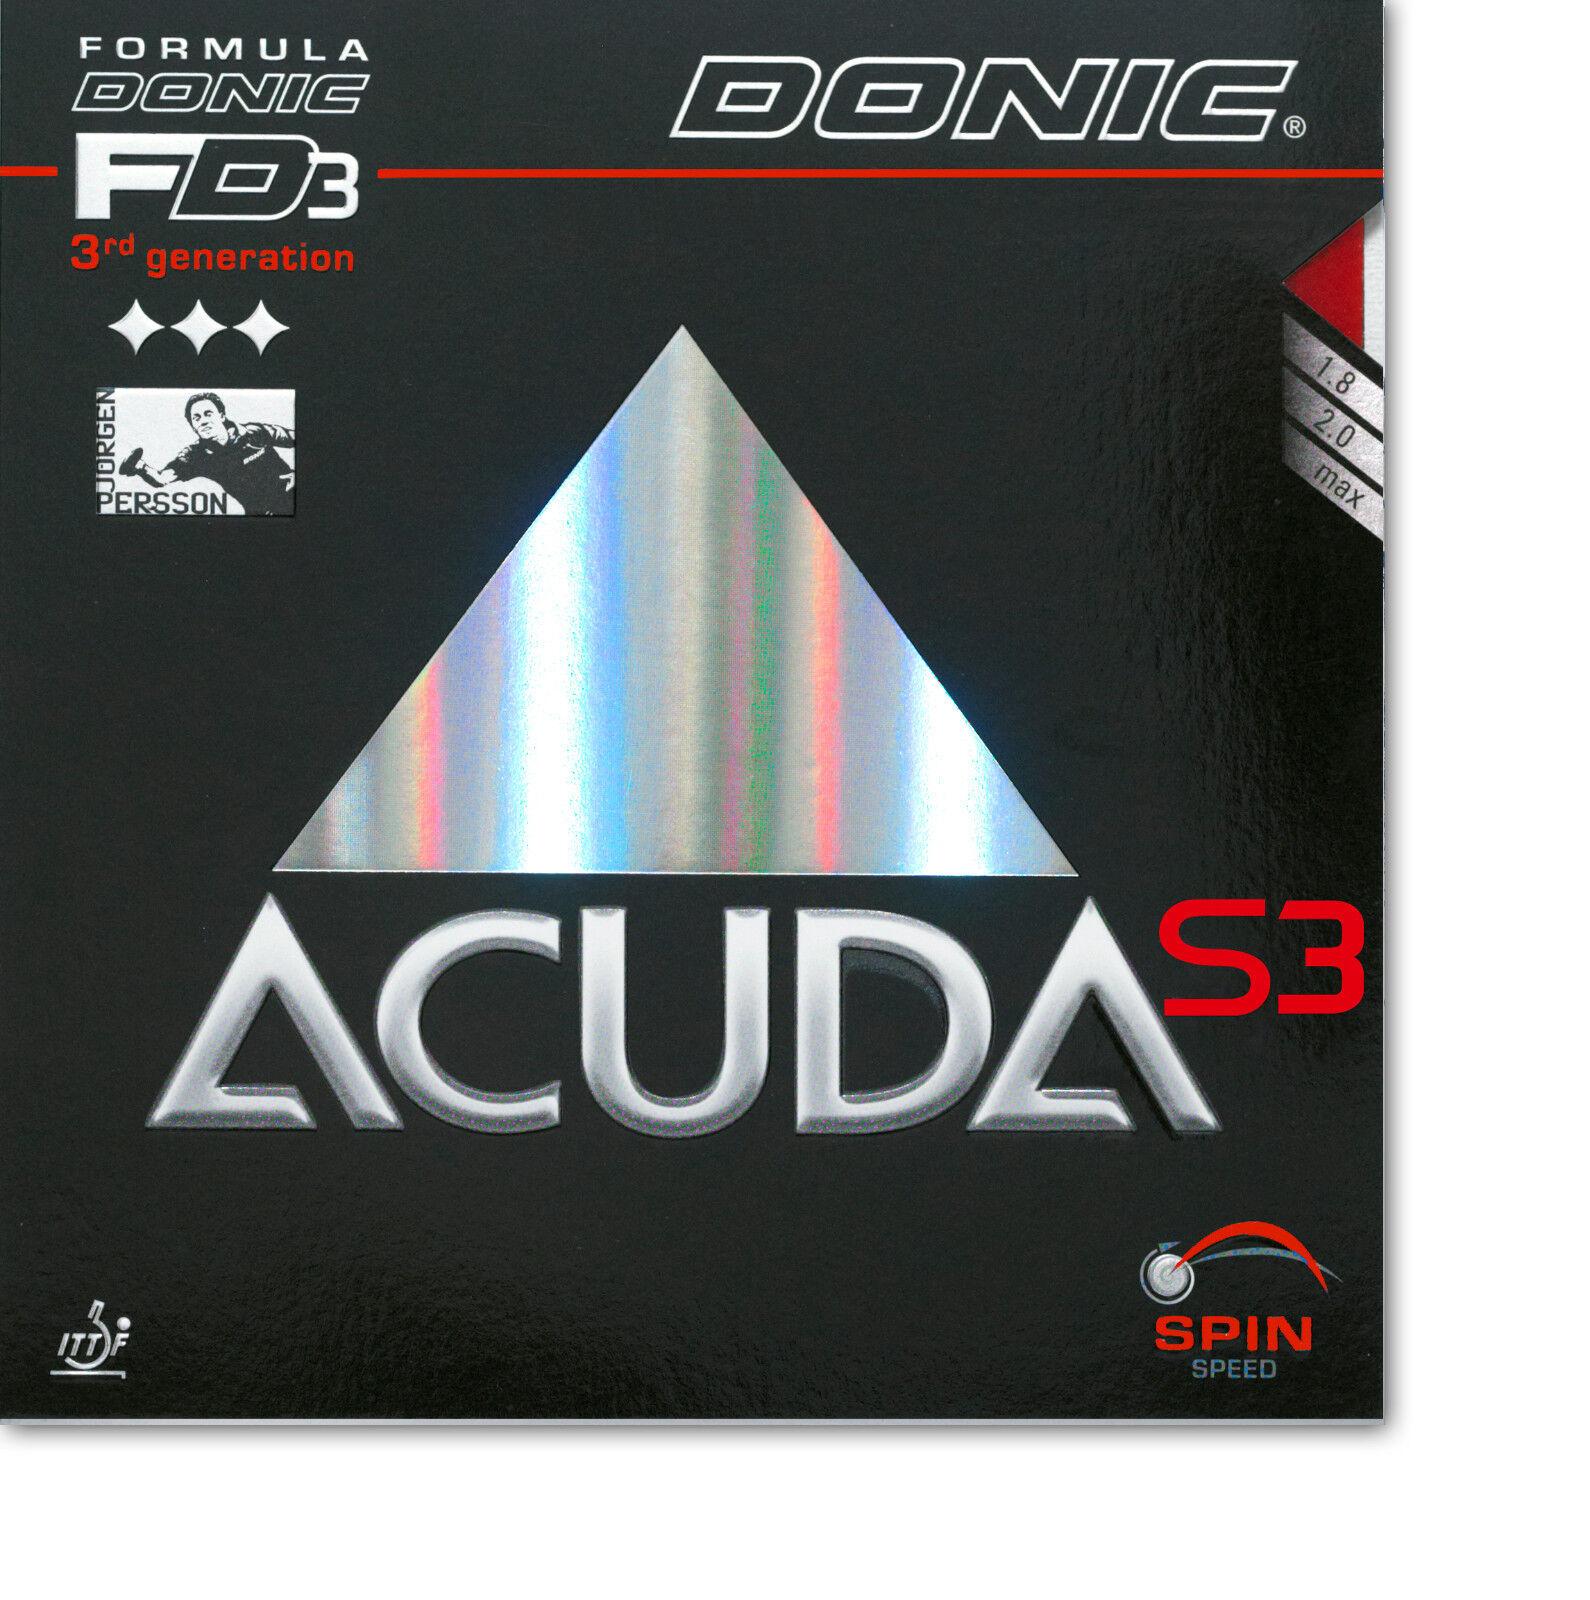 DONIC Acuda S3 1,8mm rot  NEU   OVP OVP OVP 039649